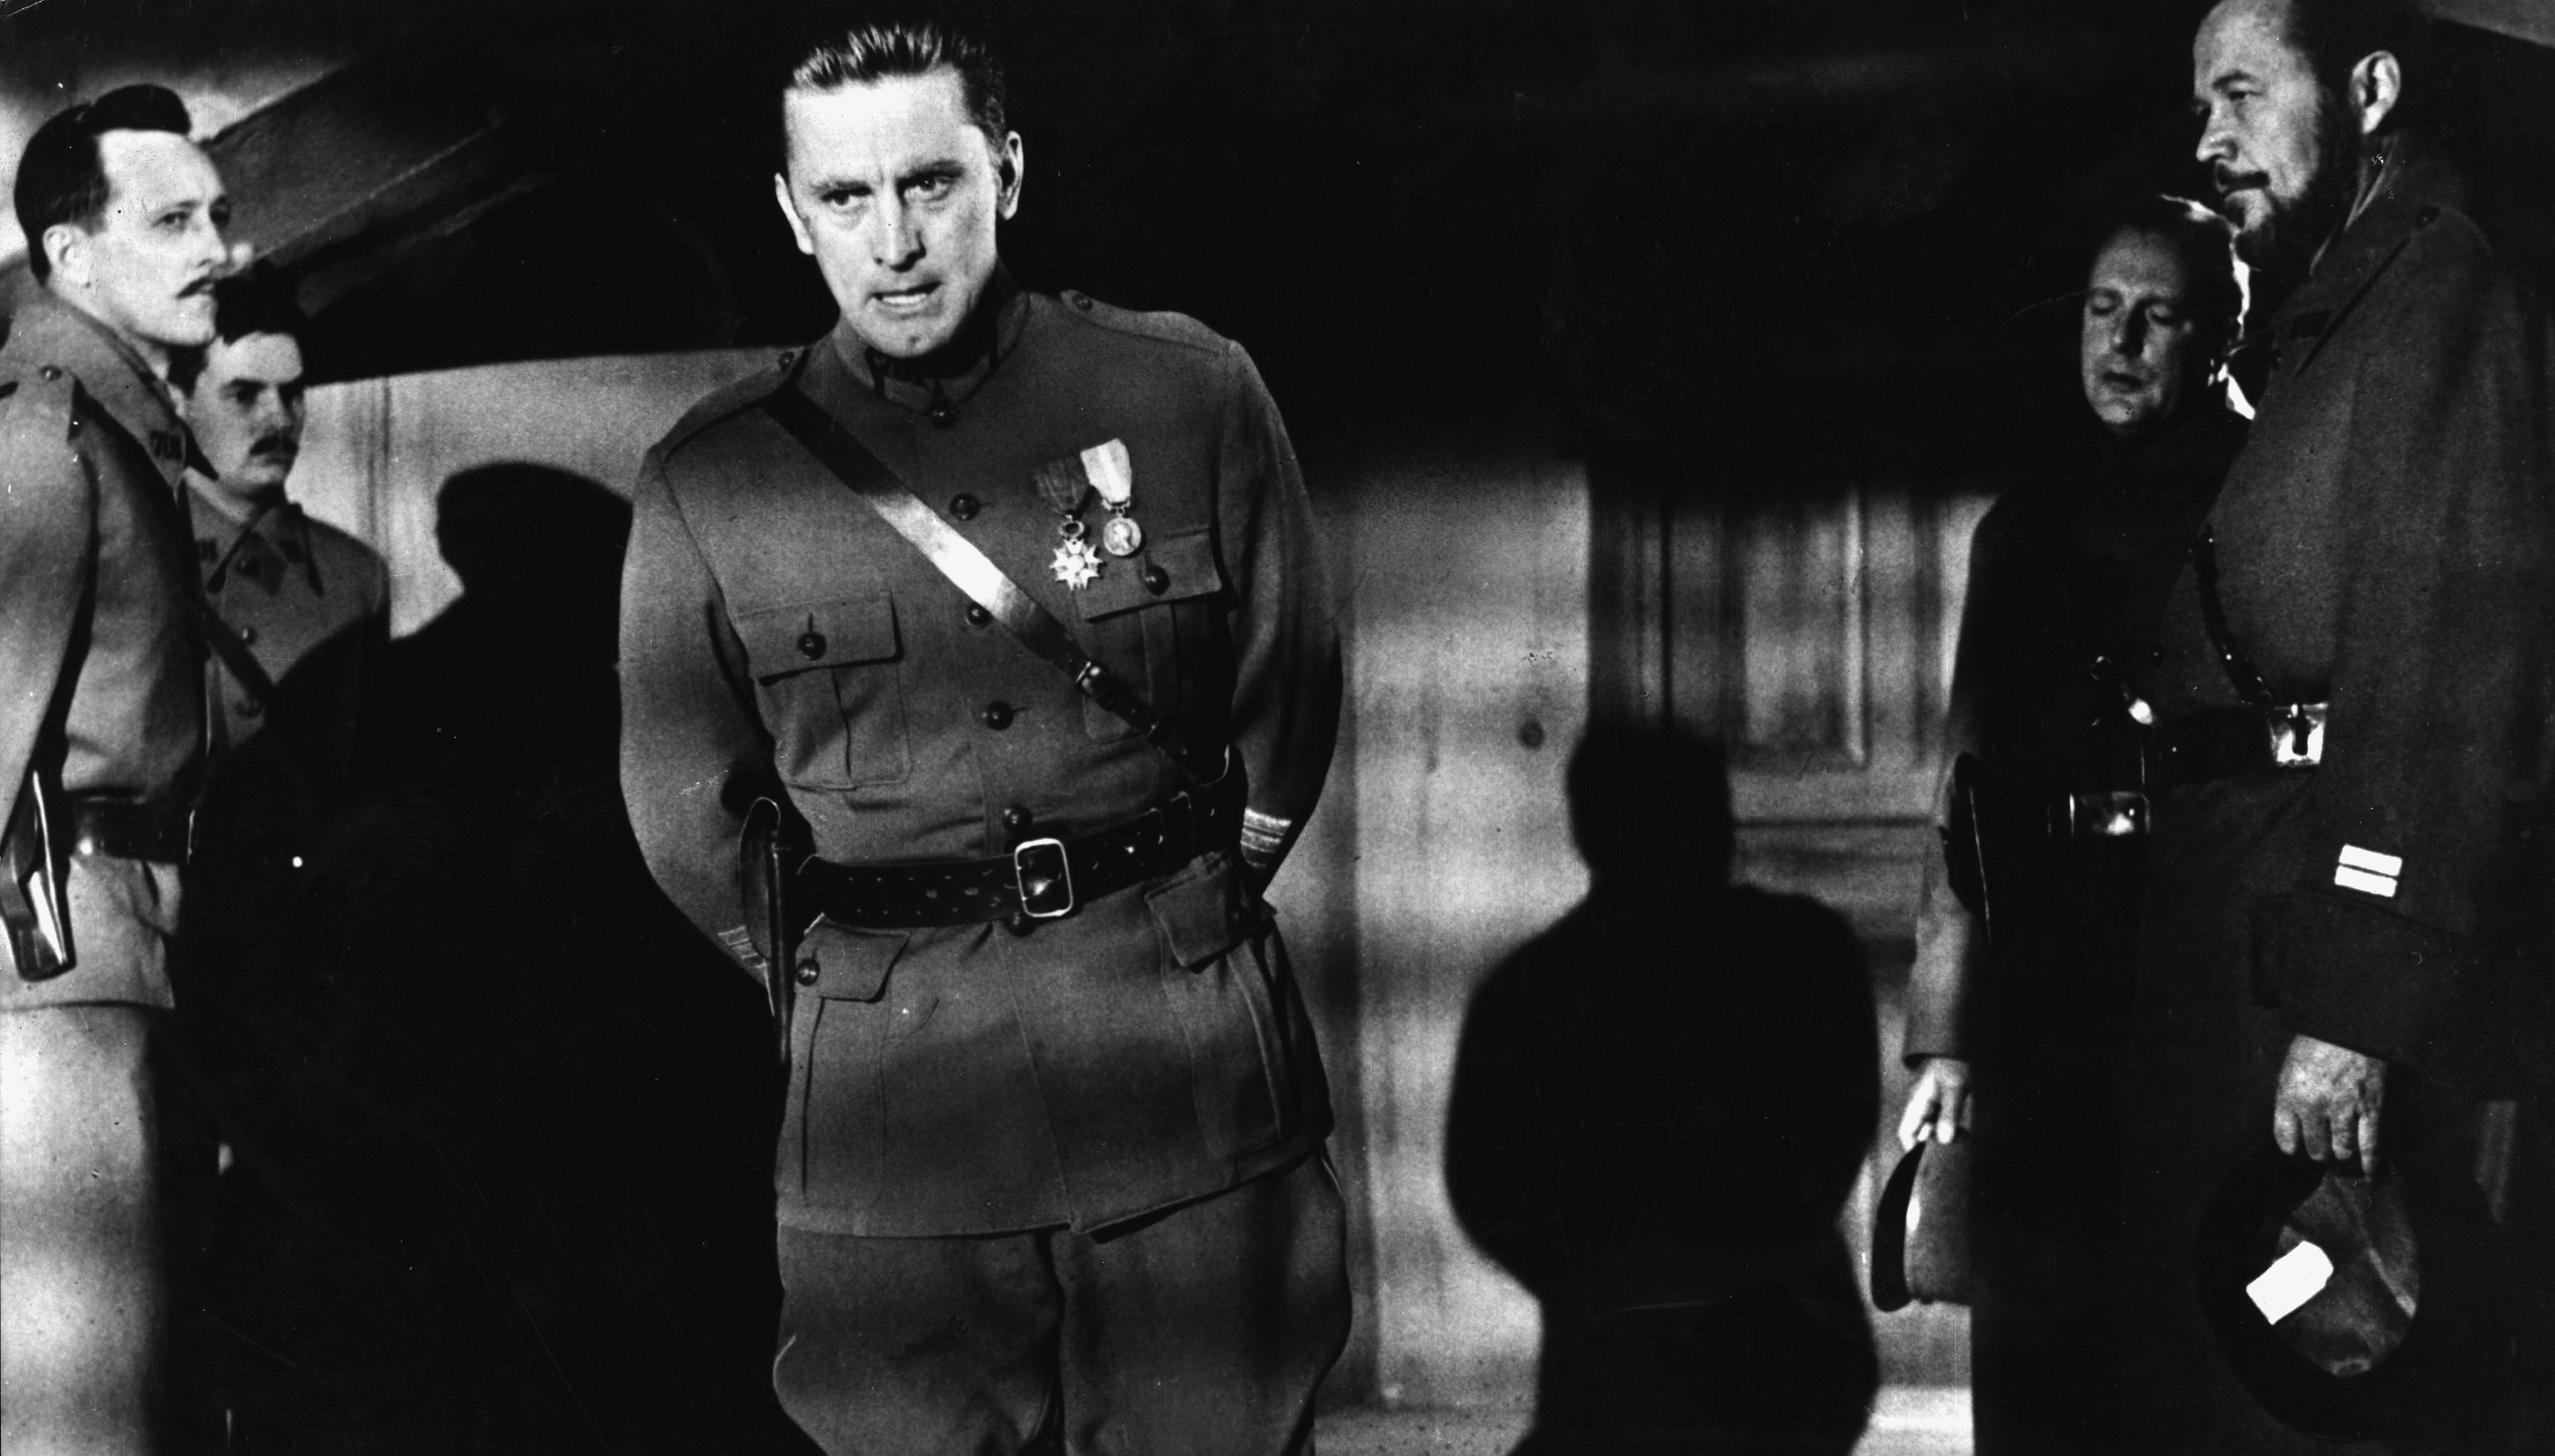 Kirk Douglas in 'Wege zum Ruhm'  Film: 'Wege zum Ruhm' (Paths of Glory) (USA 1957; Regie: Stanley Kubrick; Buch: Stanley Kubr